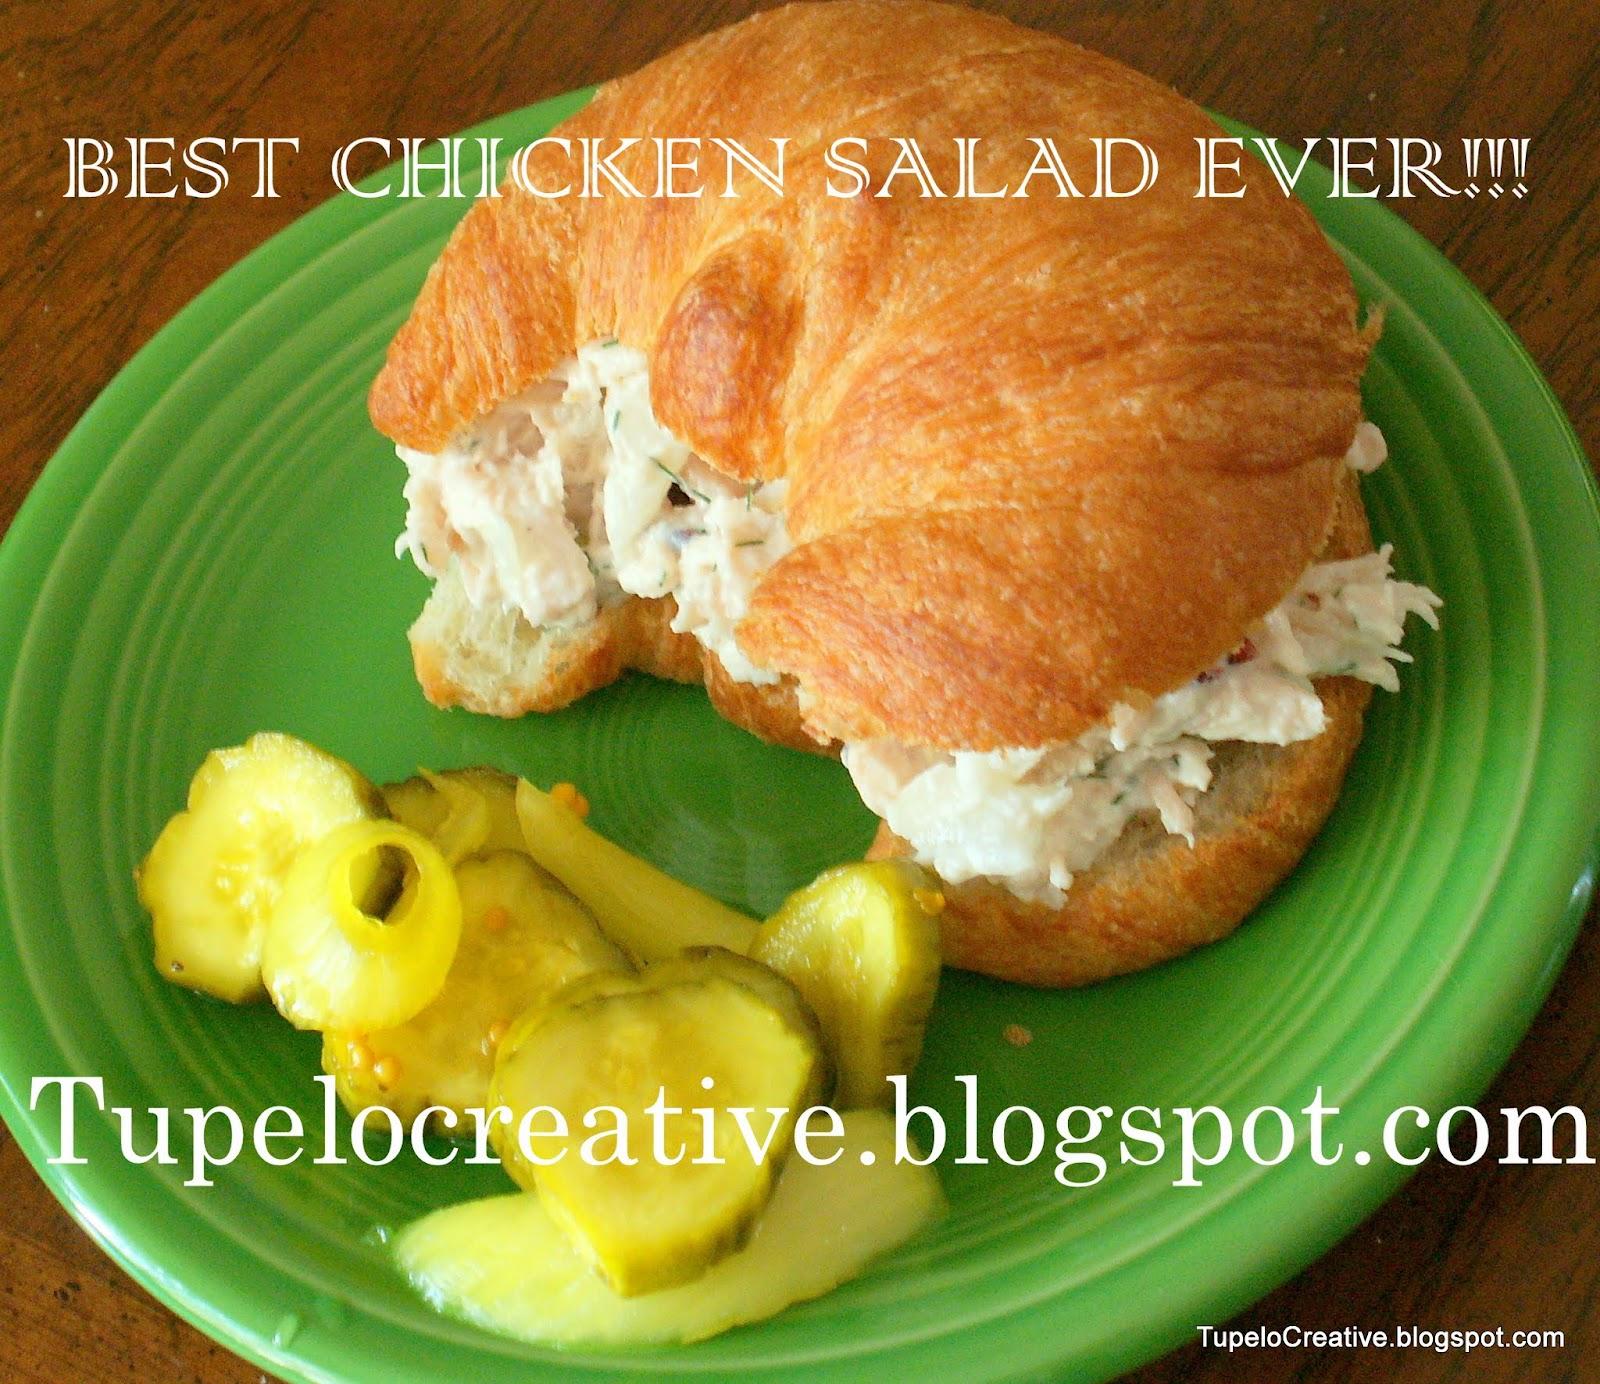 Tupelo Creative: The Best Chicken Salad Ever.